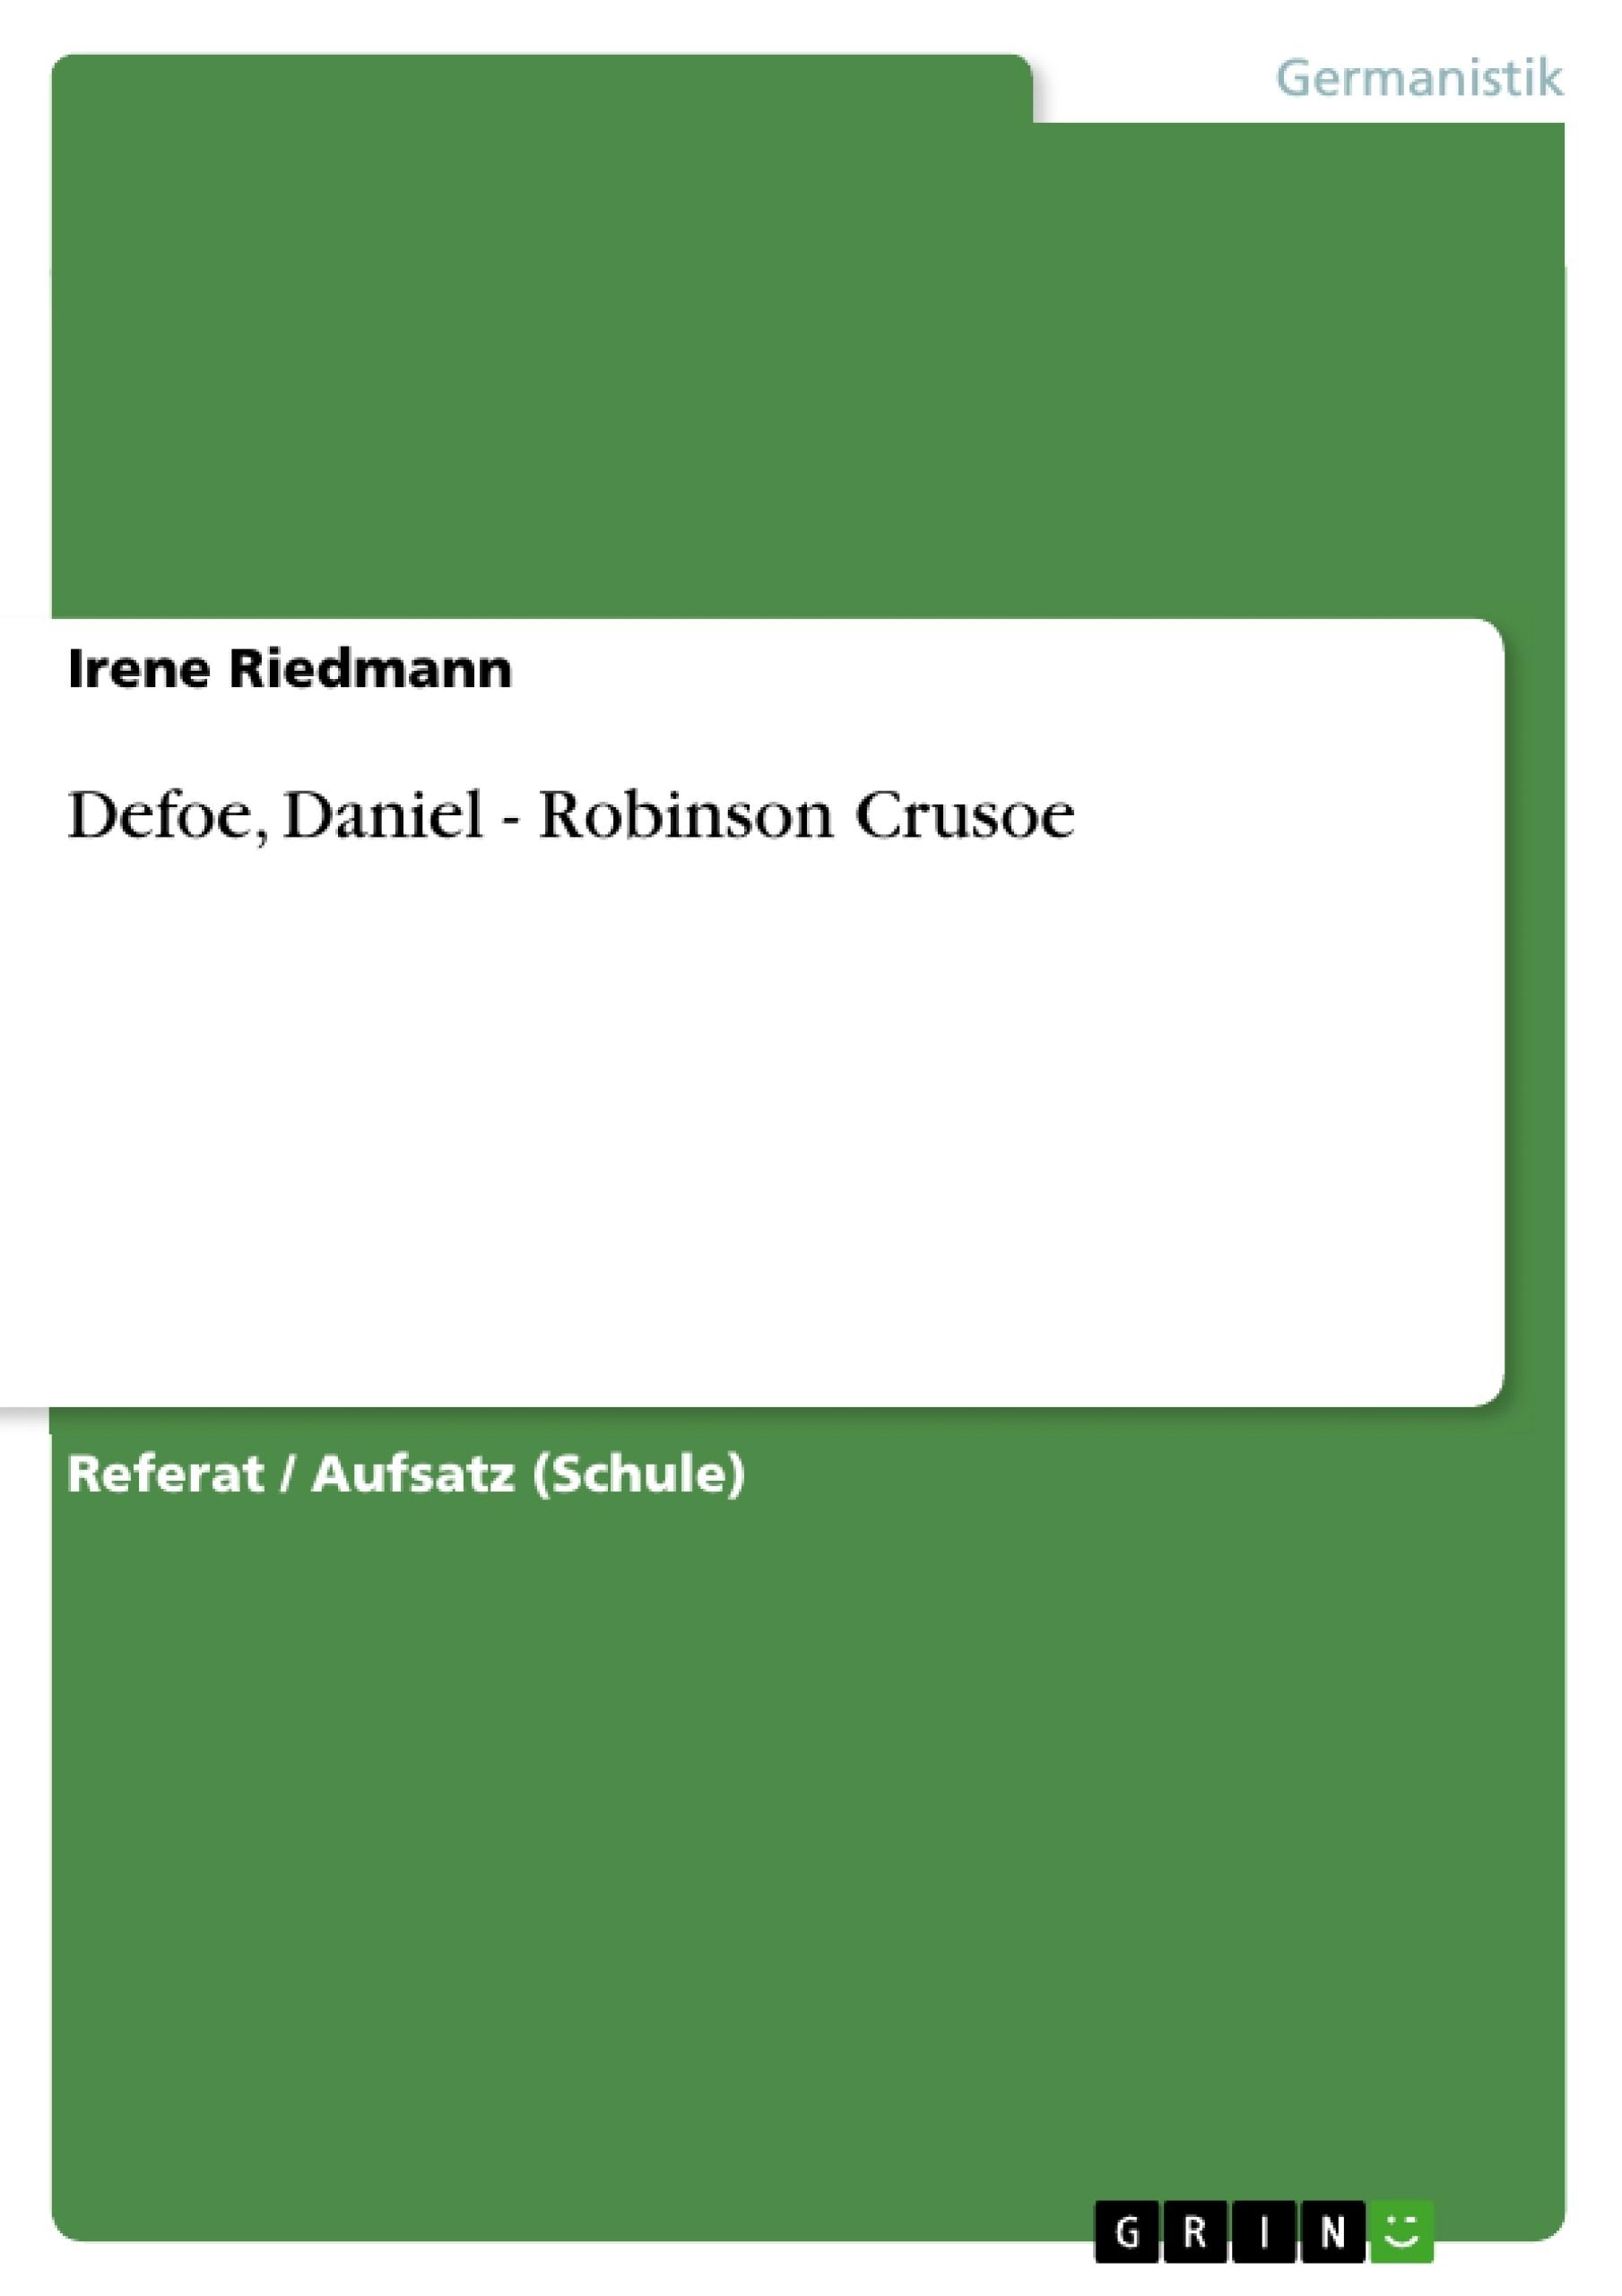 Titel: Defoe, Daniel - Robinson Crusoe